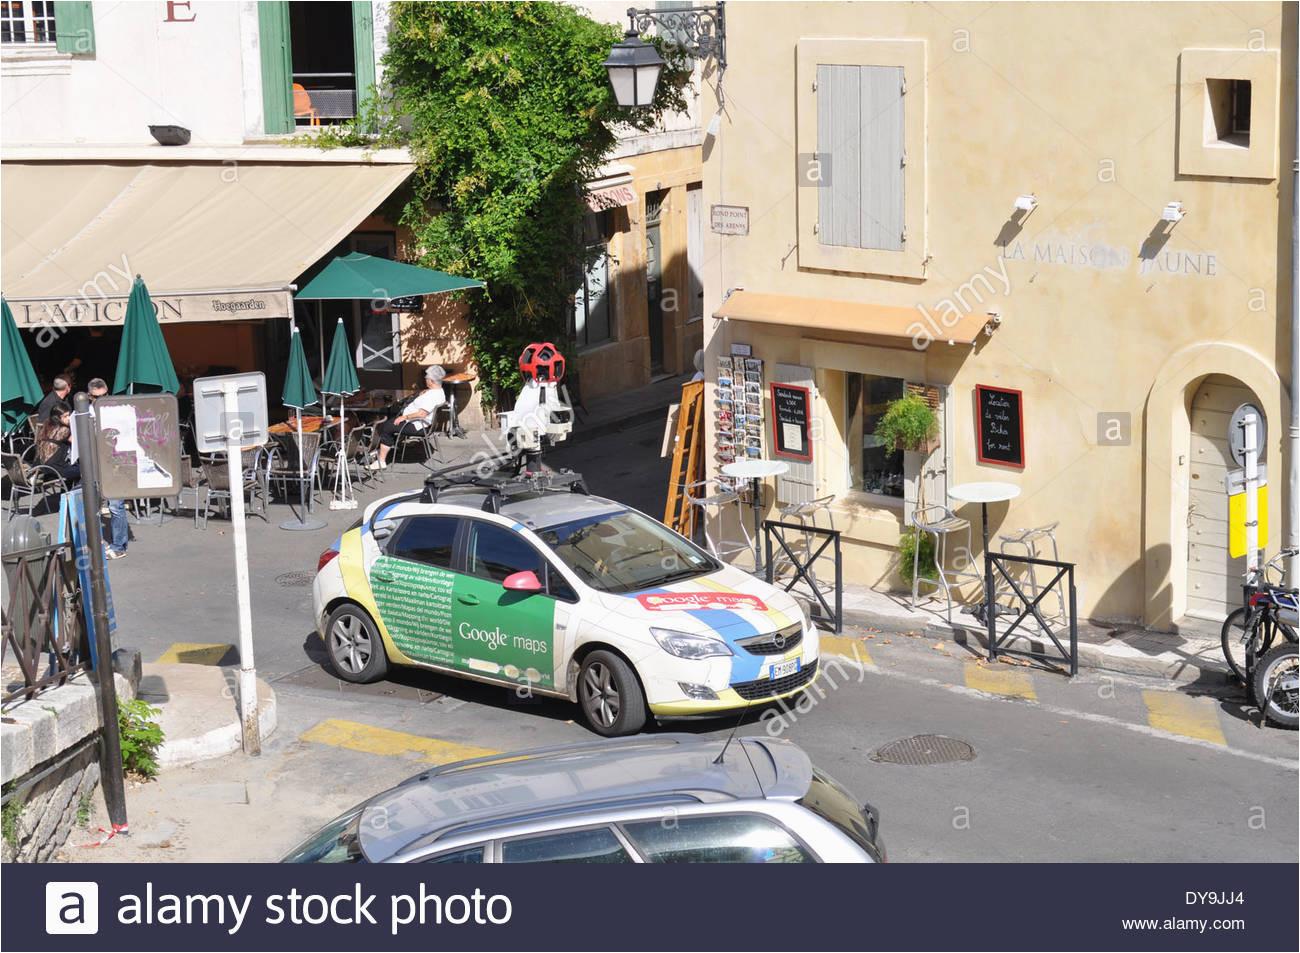 google maps stockfotos google maps bilder alamy